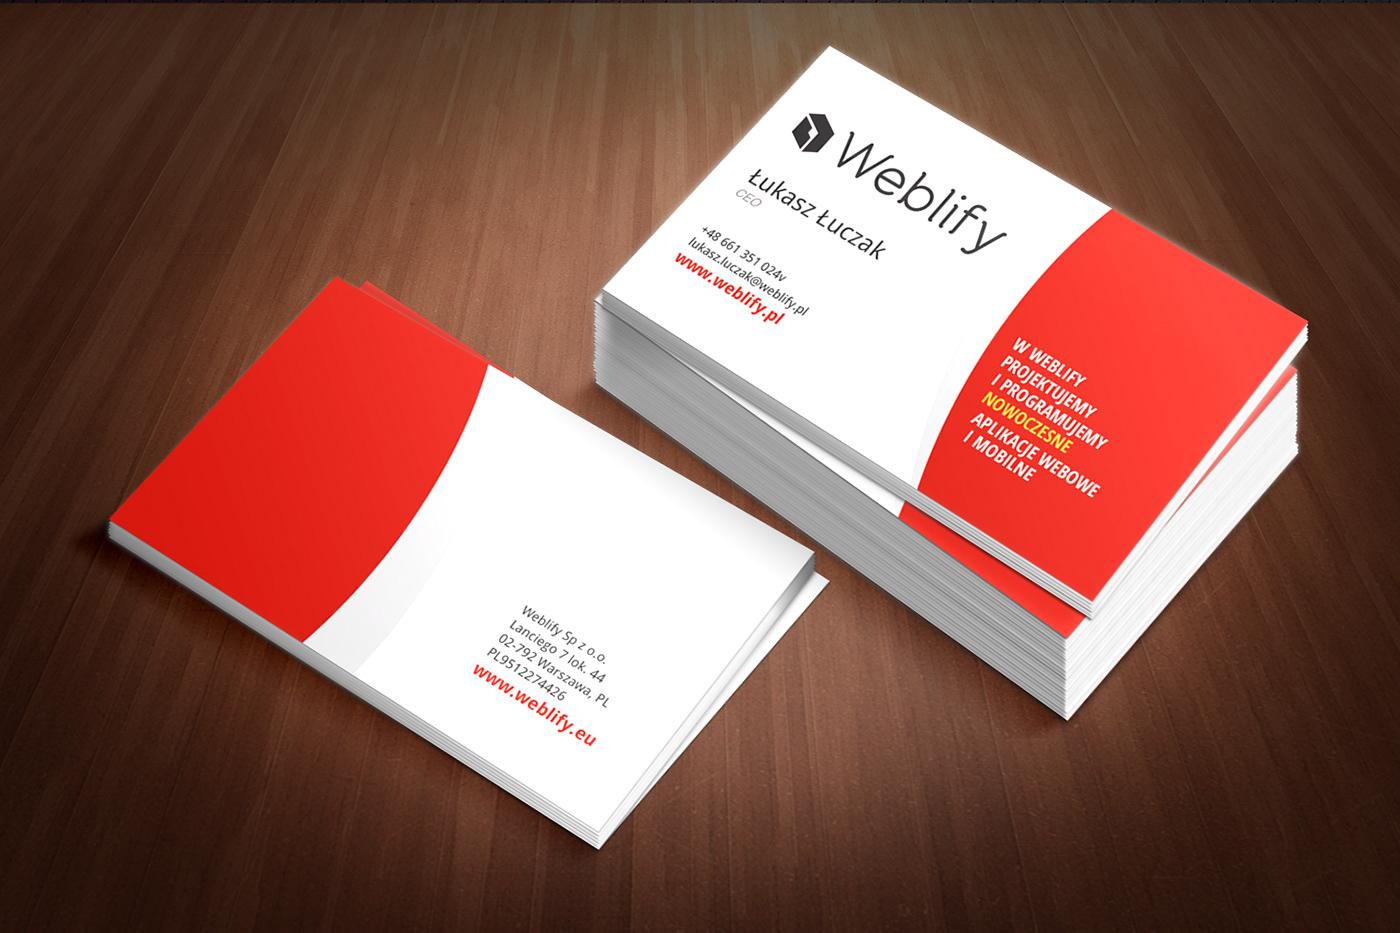 Image may contain: book, card and box